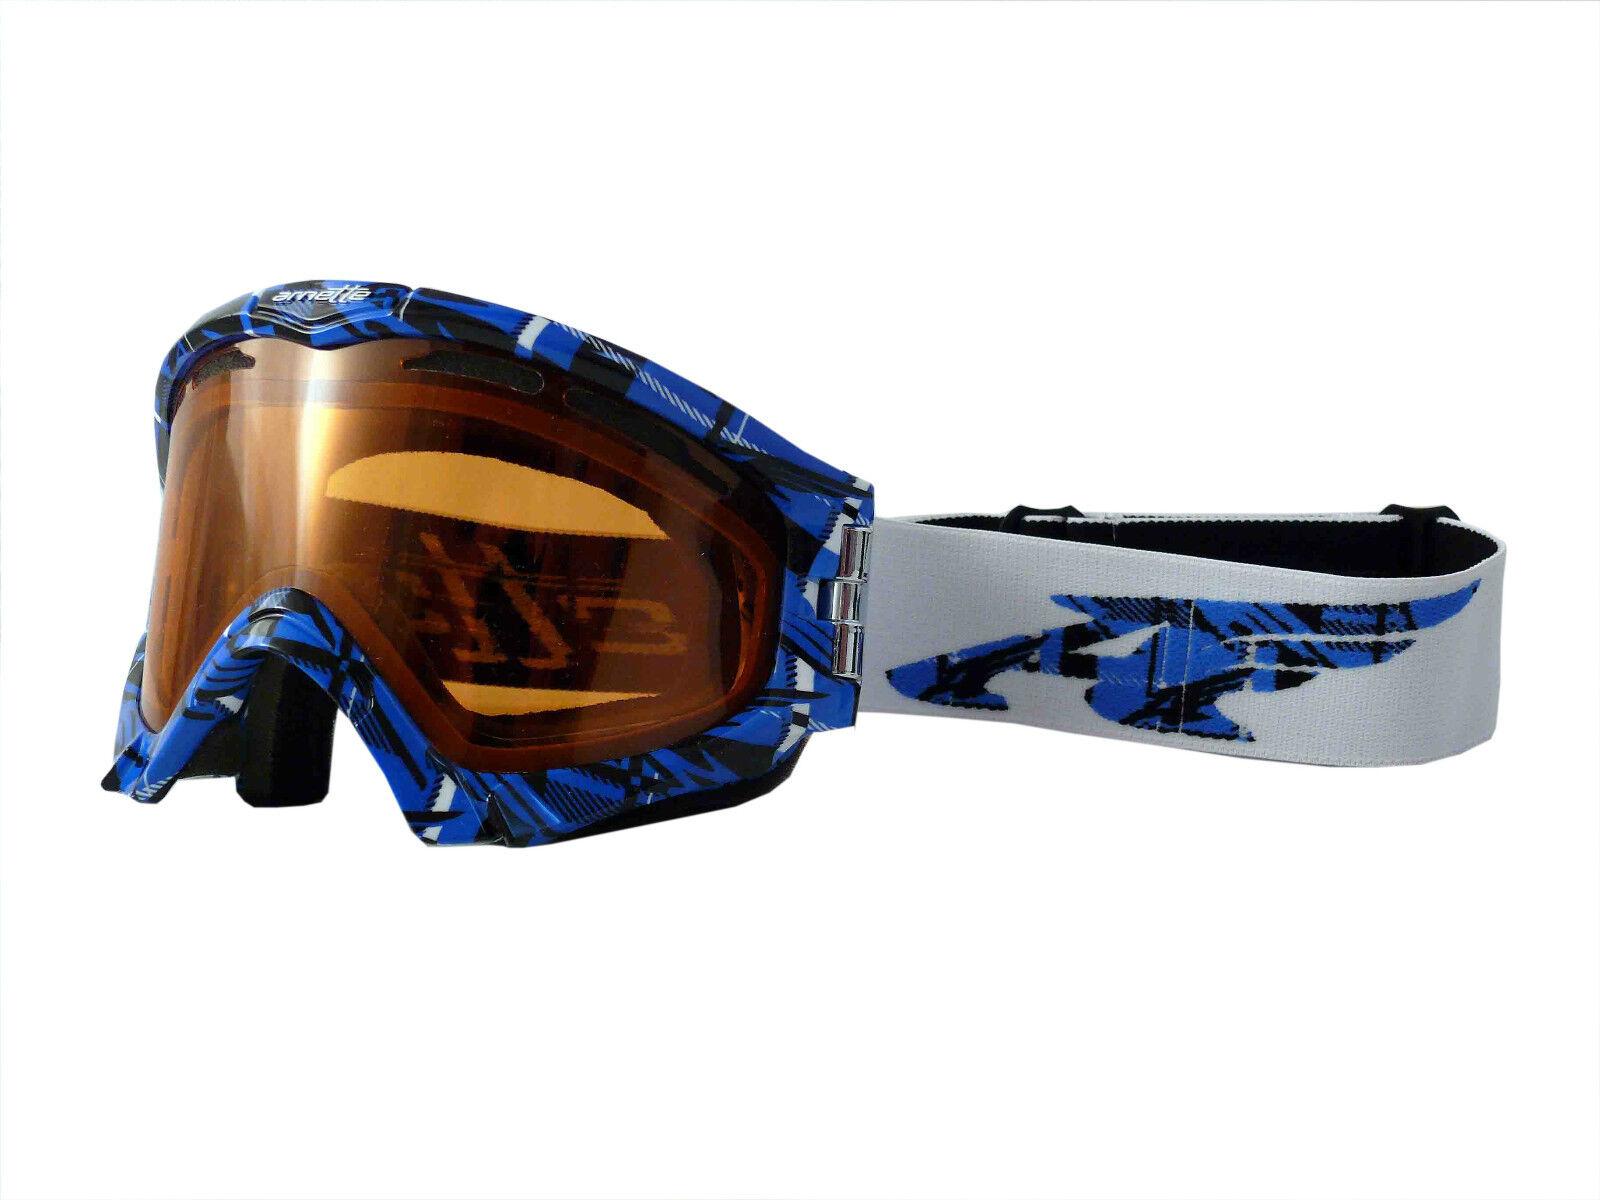 ARNETTE SERIES 3 SNOW GOGGLES AN5001 blueE PLAID FRAME PERSIMMON LENS NEW